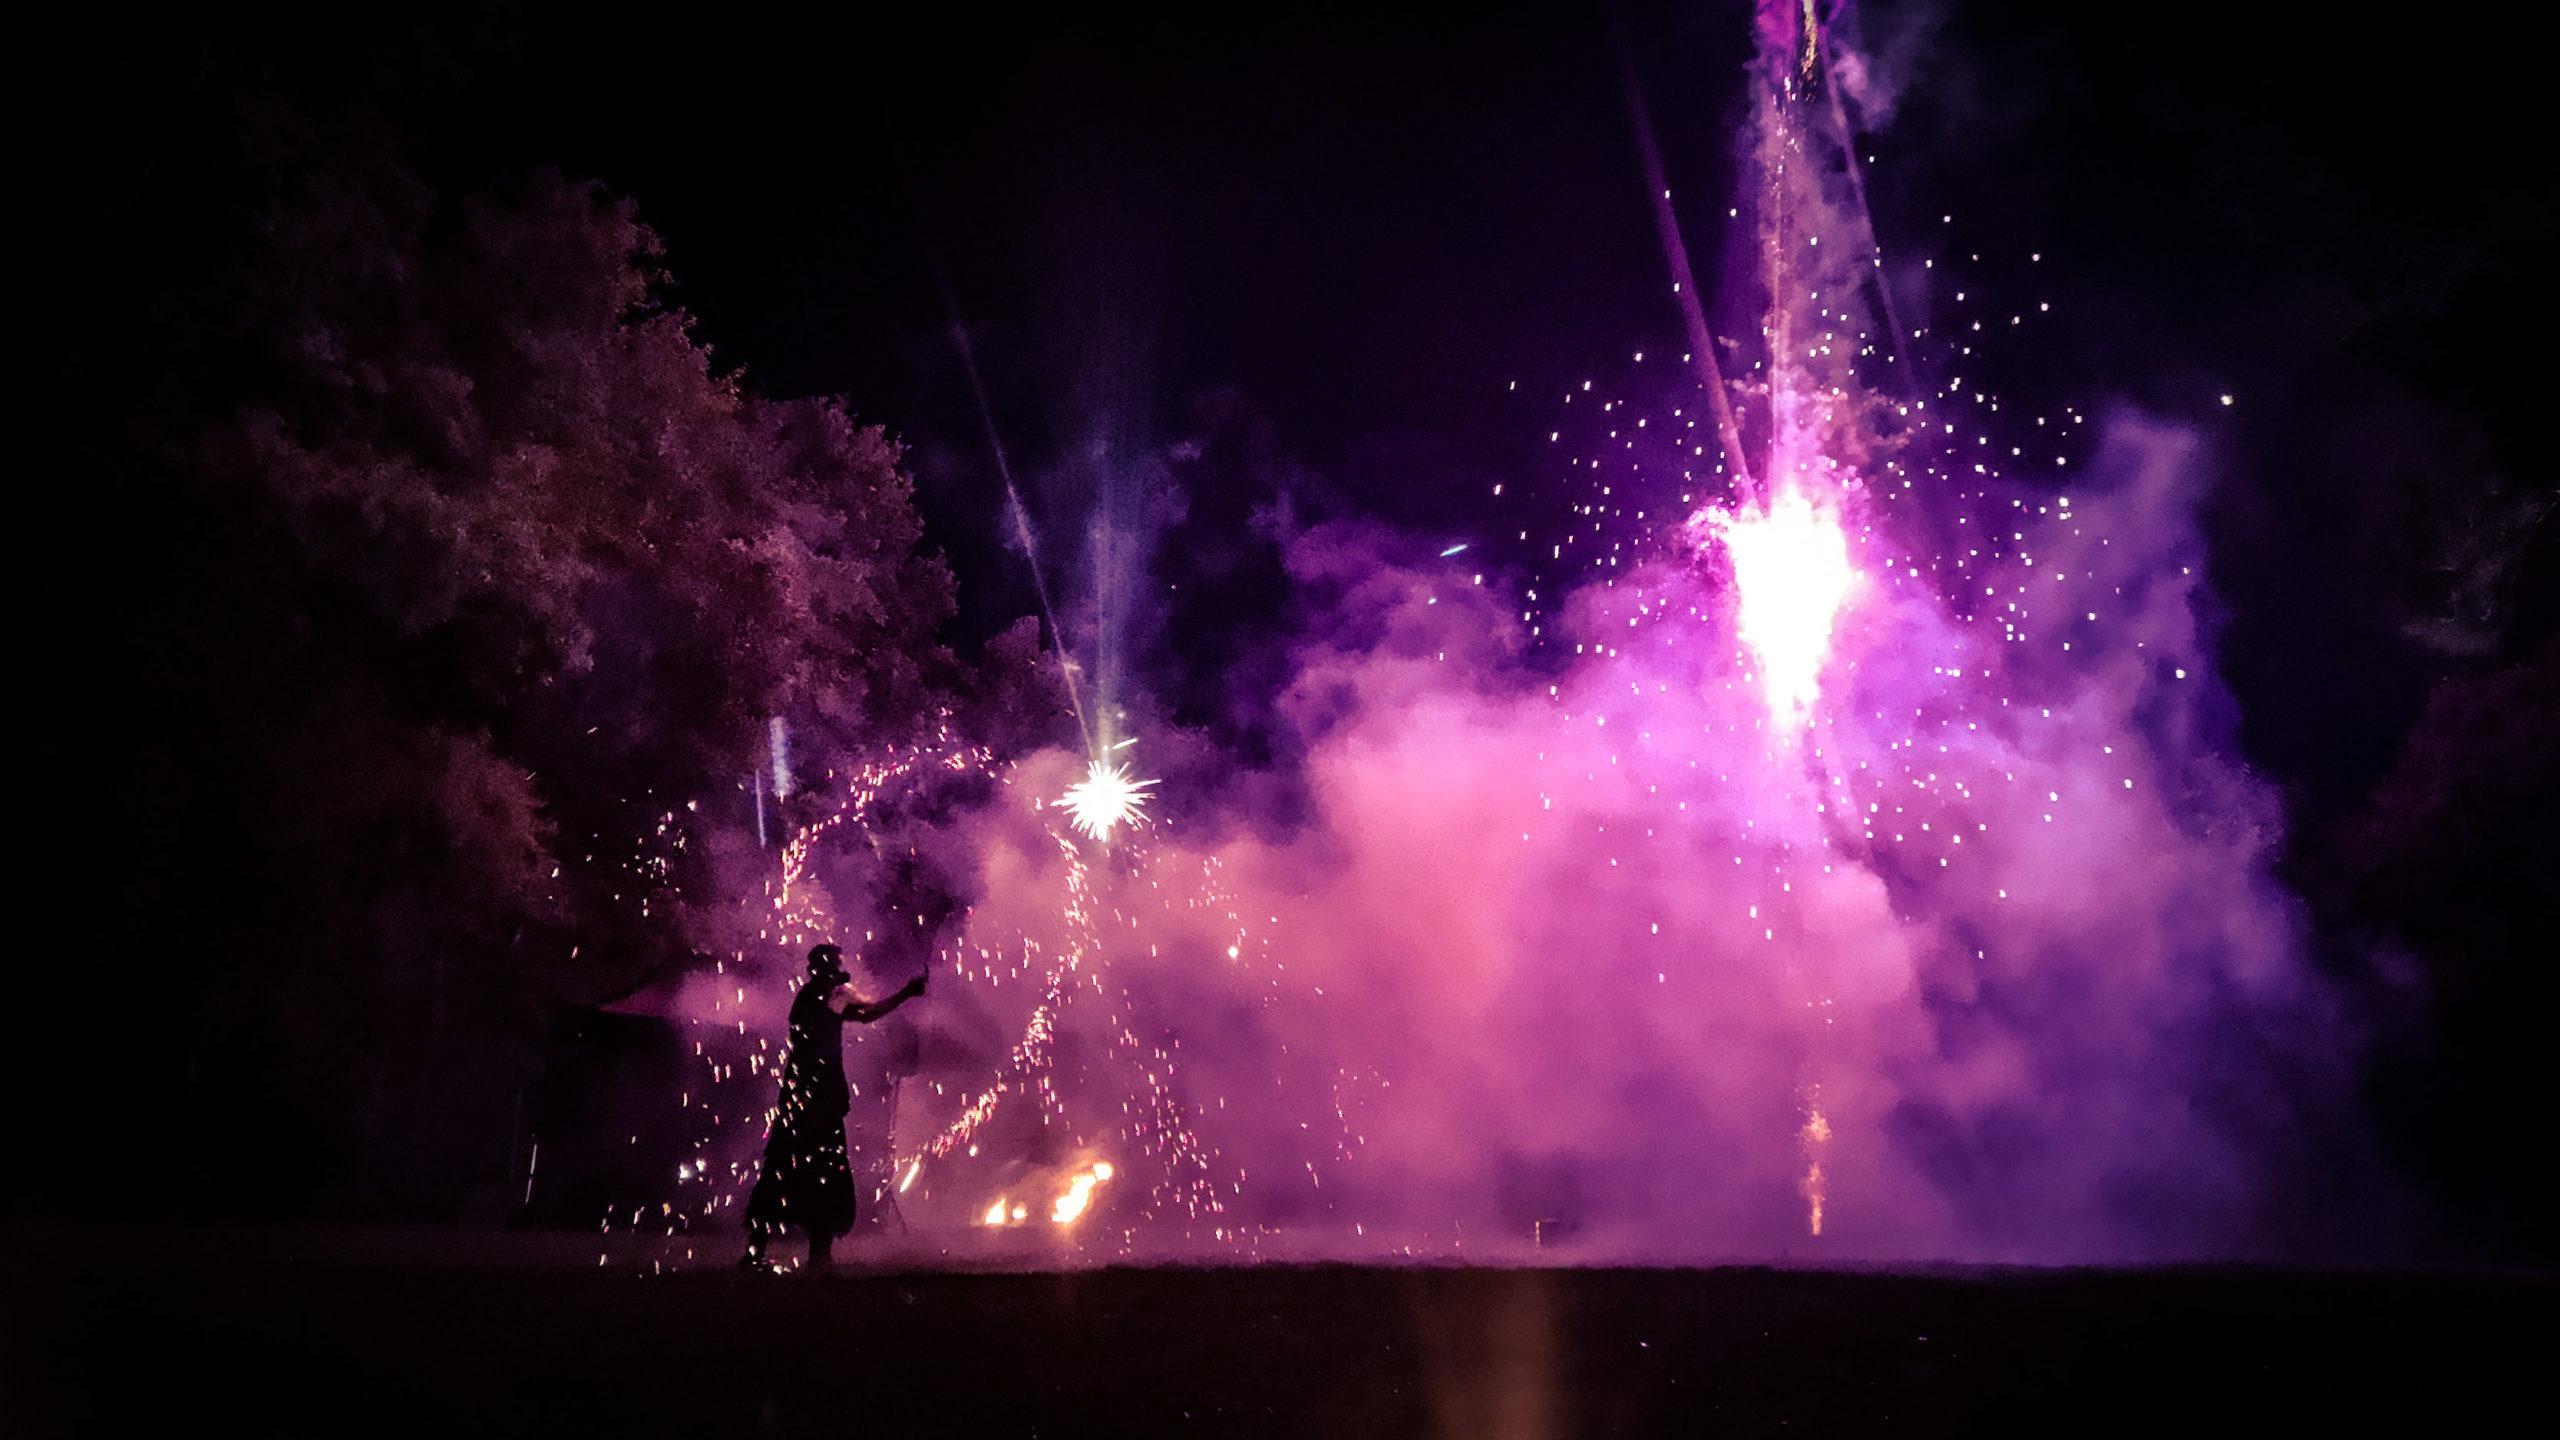 spectacle de feu,jongleur de feu, compagnie belizama, cracheurs de feu, spectacle de rue, spectacle de feu bretagne, spectacle pyrotechnique, belizama, spectacle de feu mariage, spectacle de feu médiéval